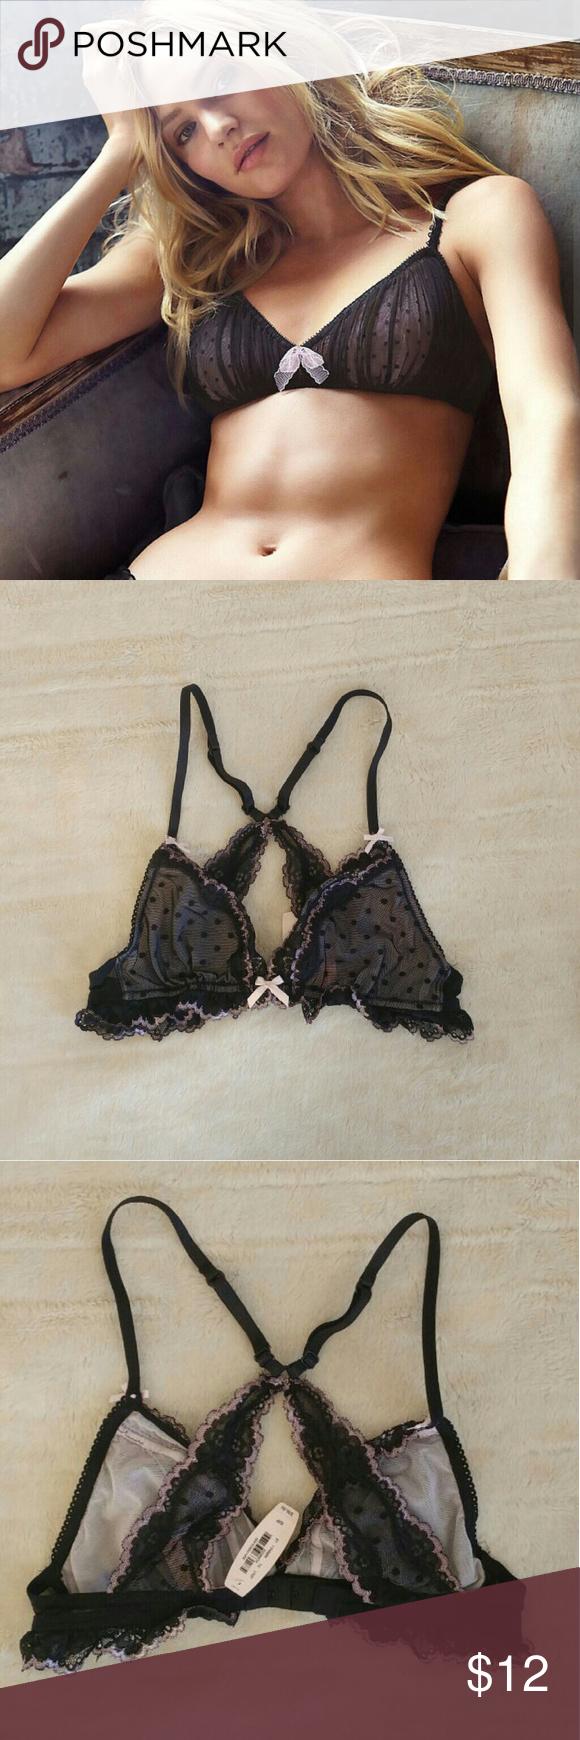 NWT VS Small Polka Dot Bralette NWT VS Small Polka Dot Bralette *PRICE FIRM* Victoria's Secret Intimates & Sleepwear Bras